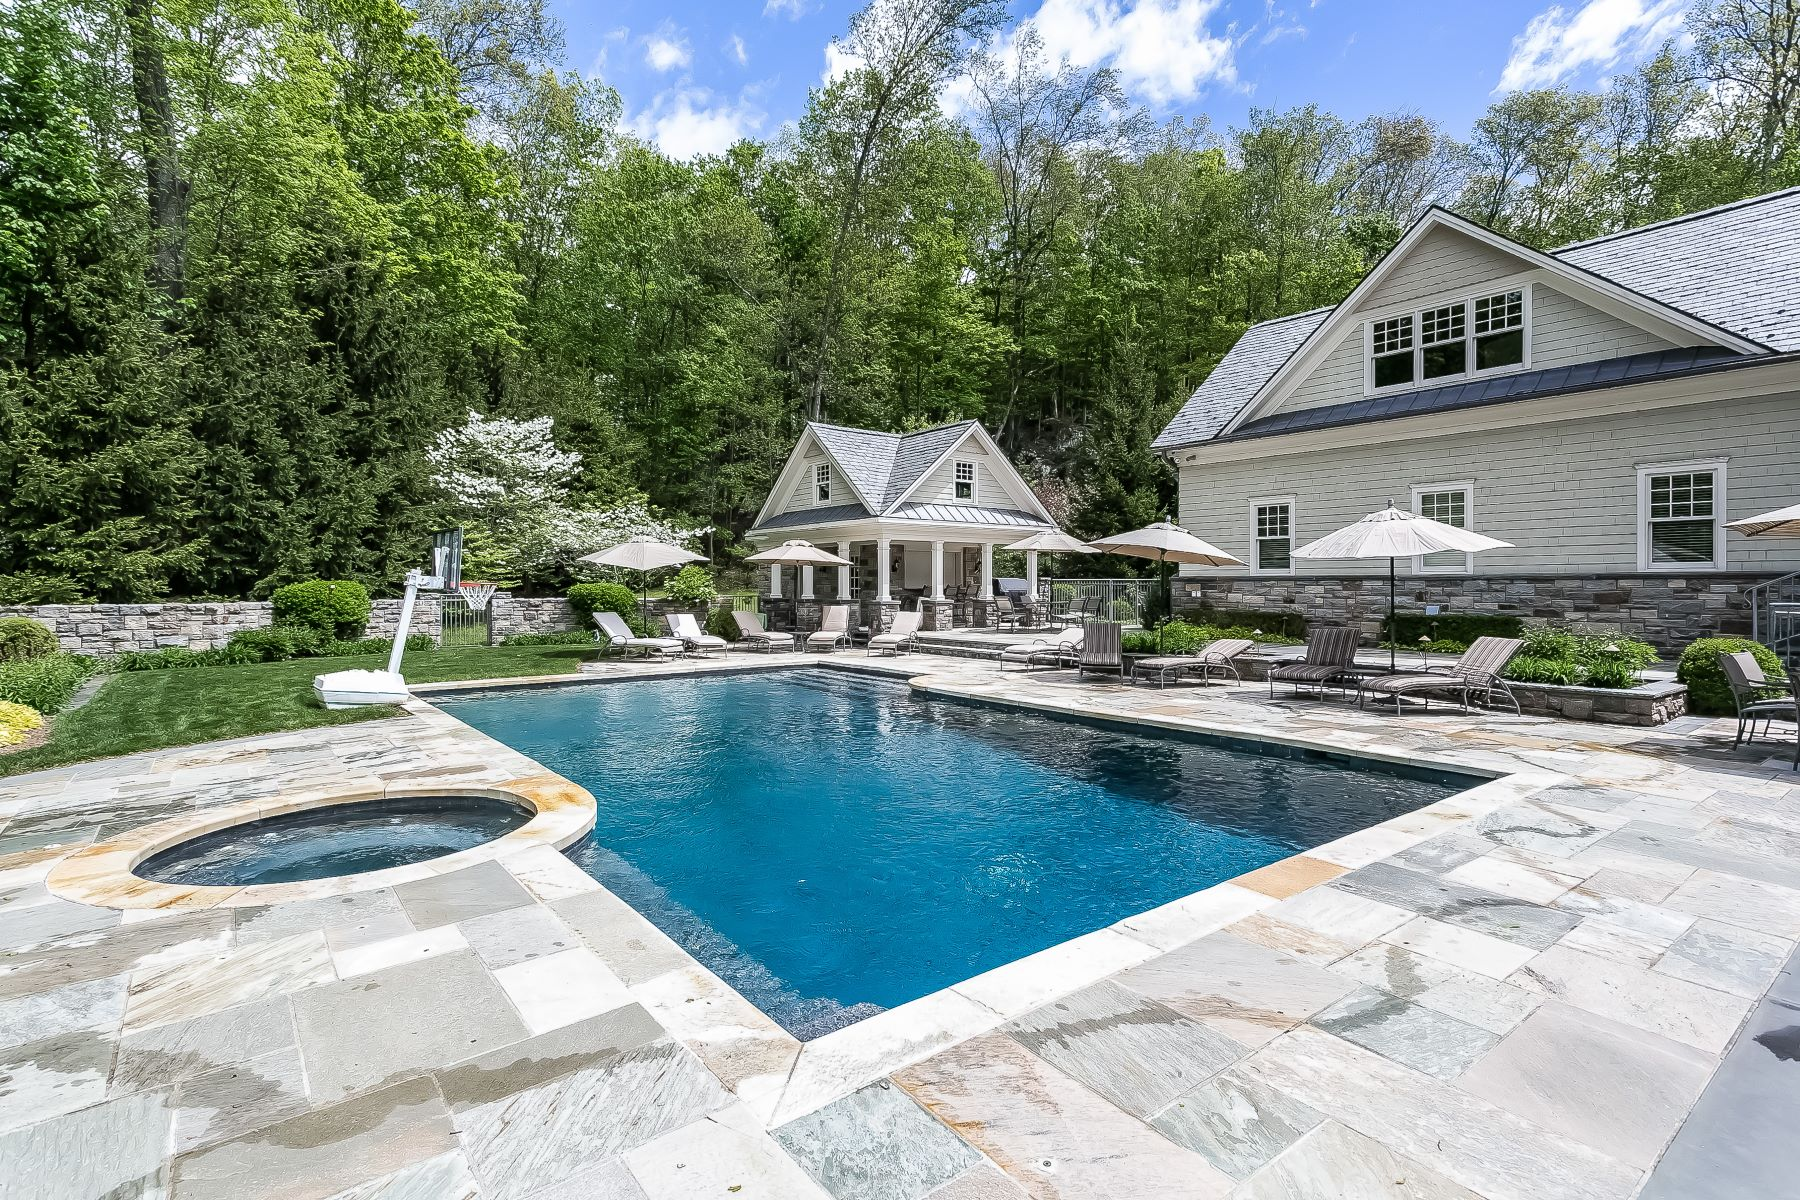 Single Family Homes for Sale at 16 Cerf Lane Mount Kisco, New York 10549 United States